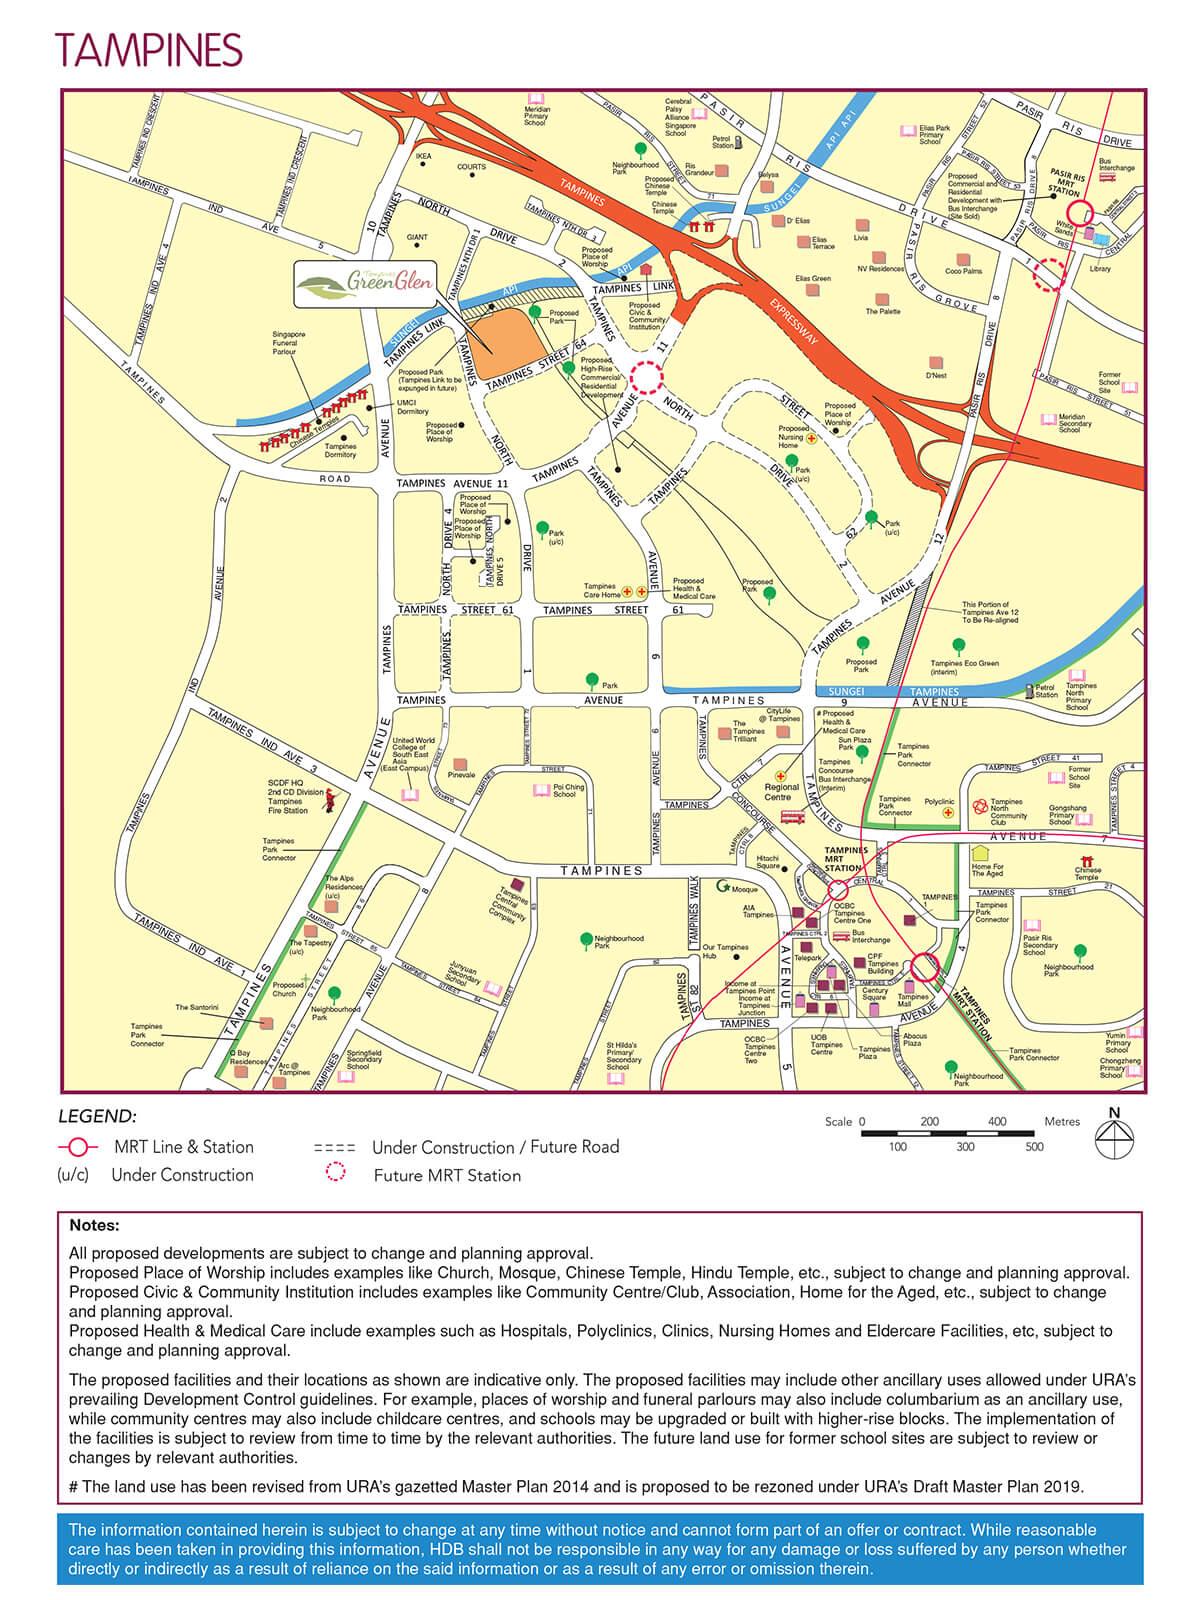 tampines greenglen location map